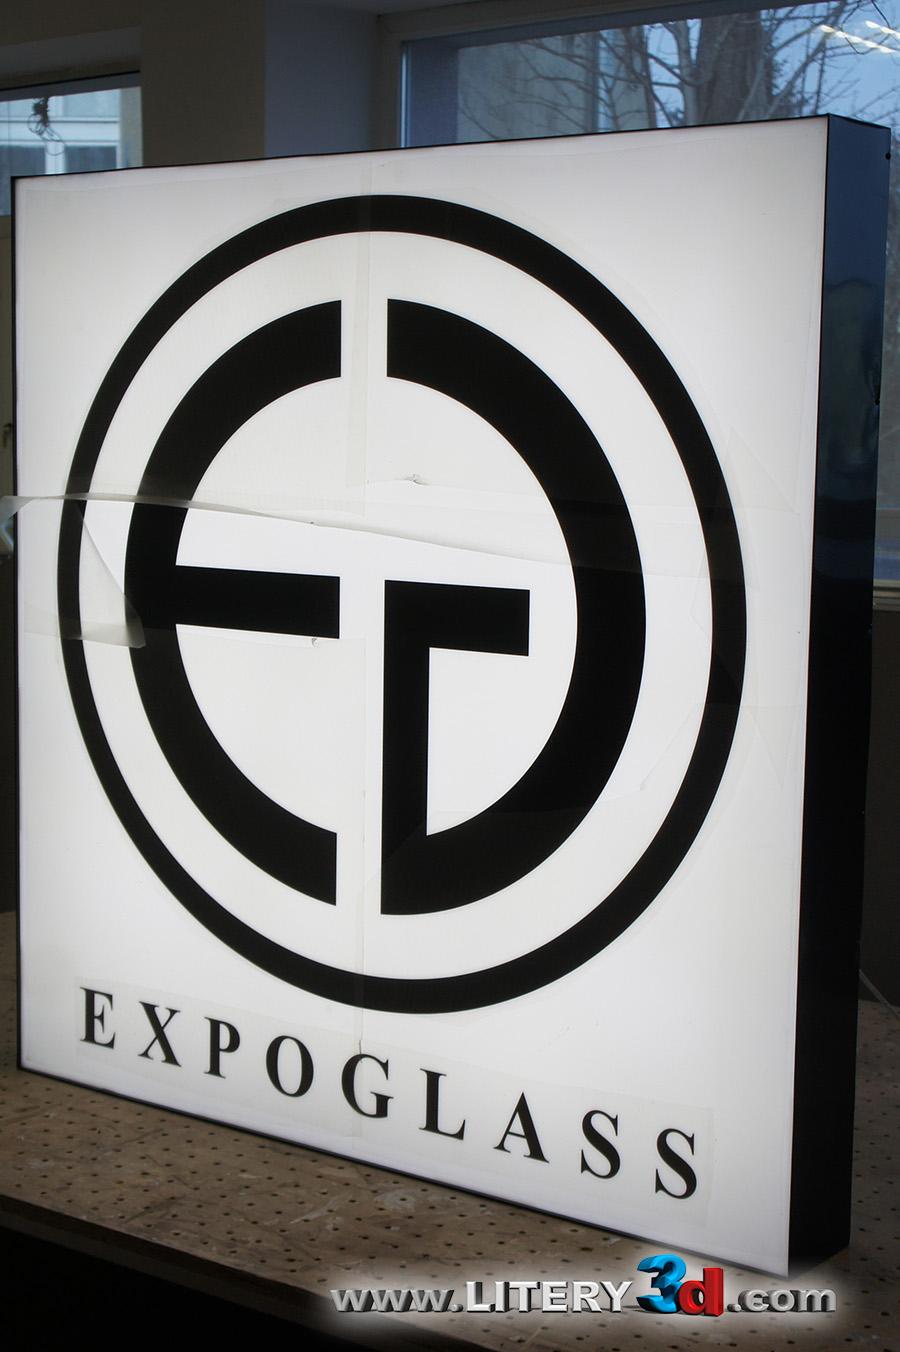 EXPOGLASS_2